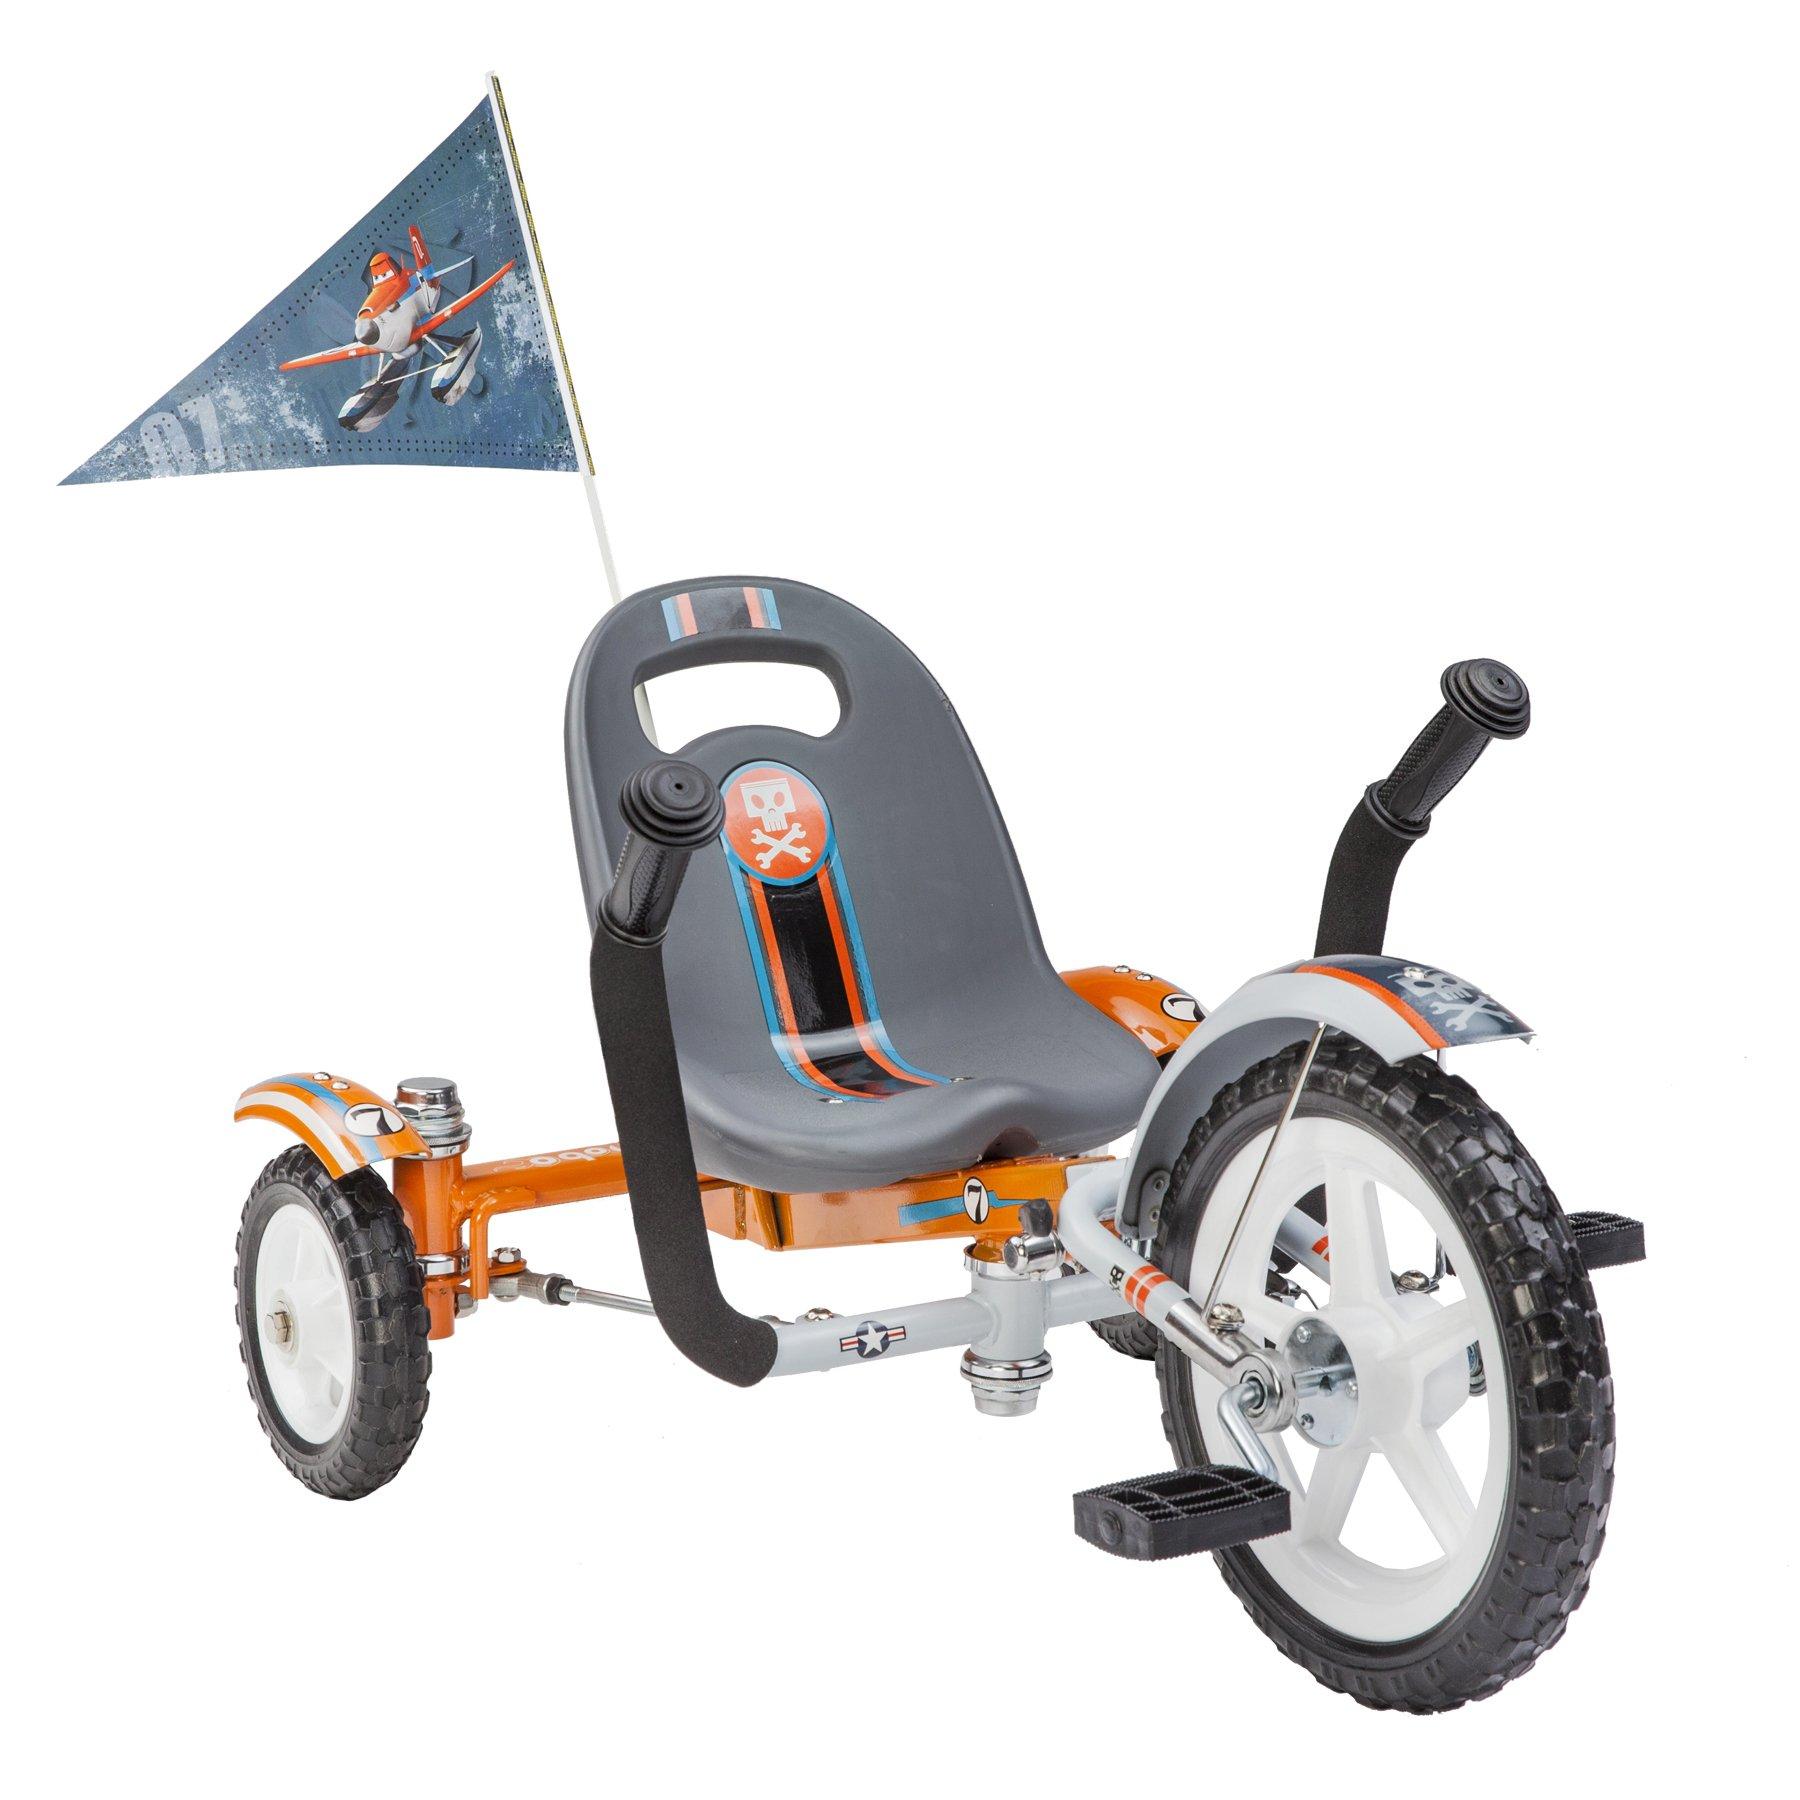 Mobo Tot Disney Planes Dusty: A Toddler's Ergonomic Three Wheeled Cruiser Ride On